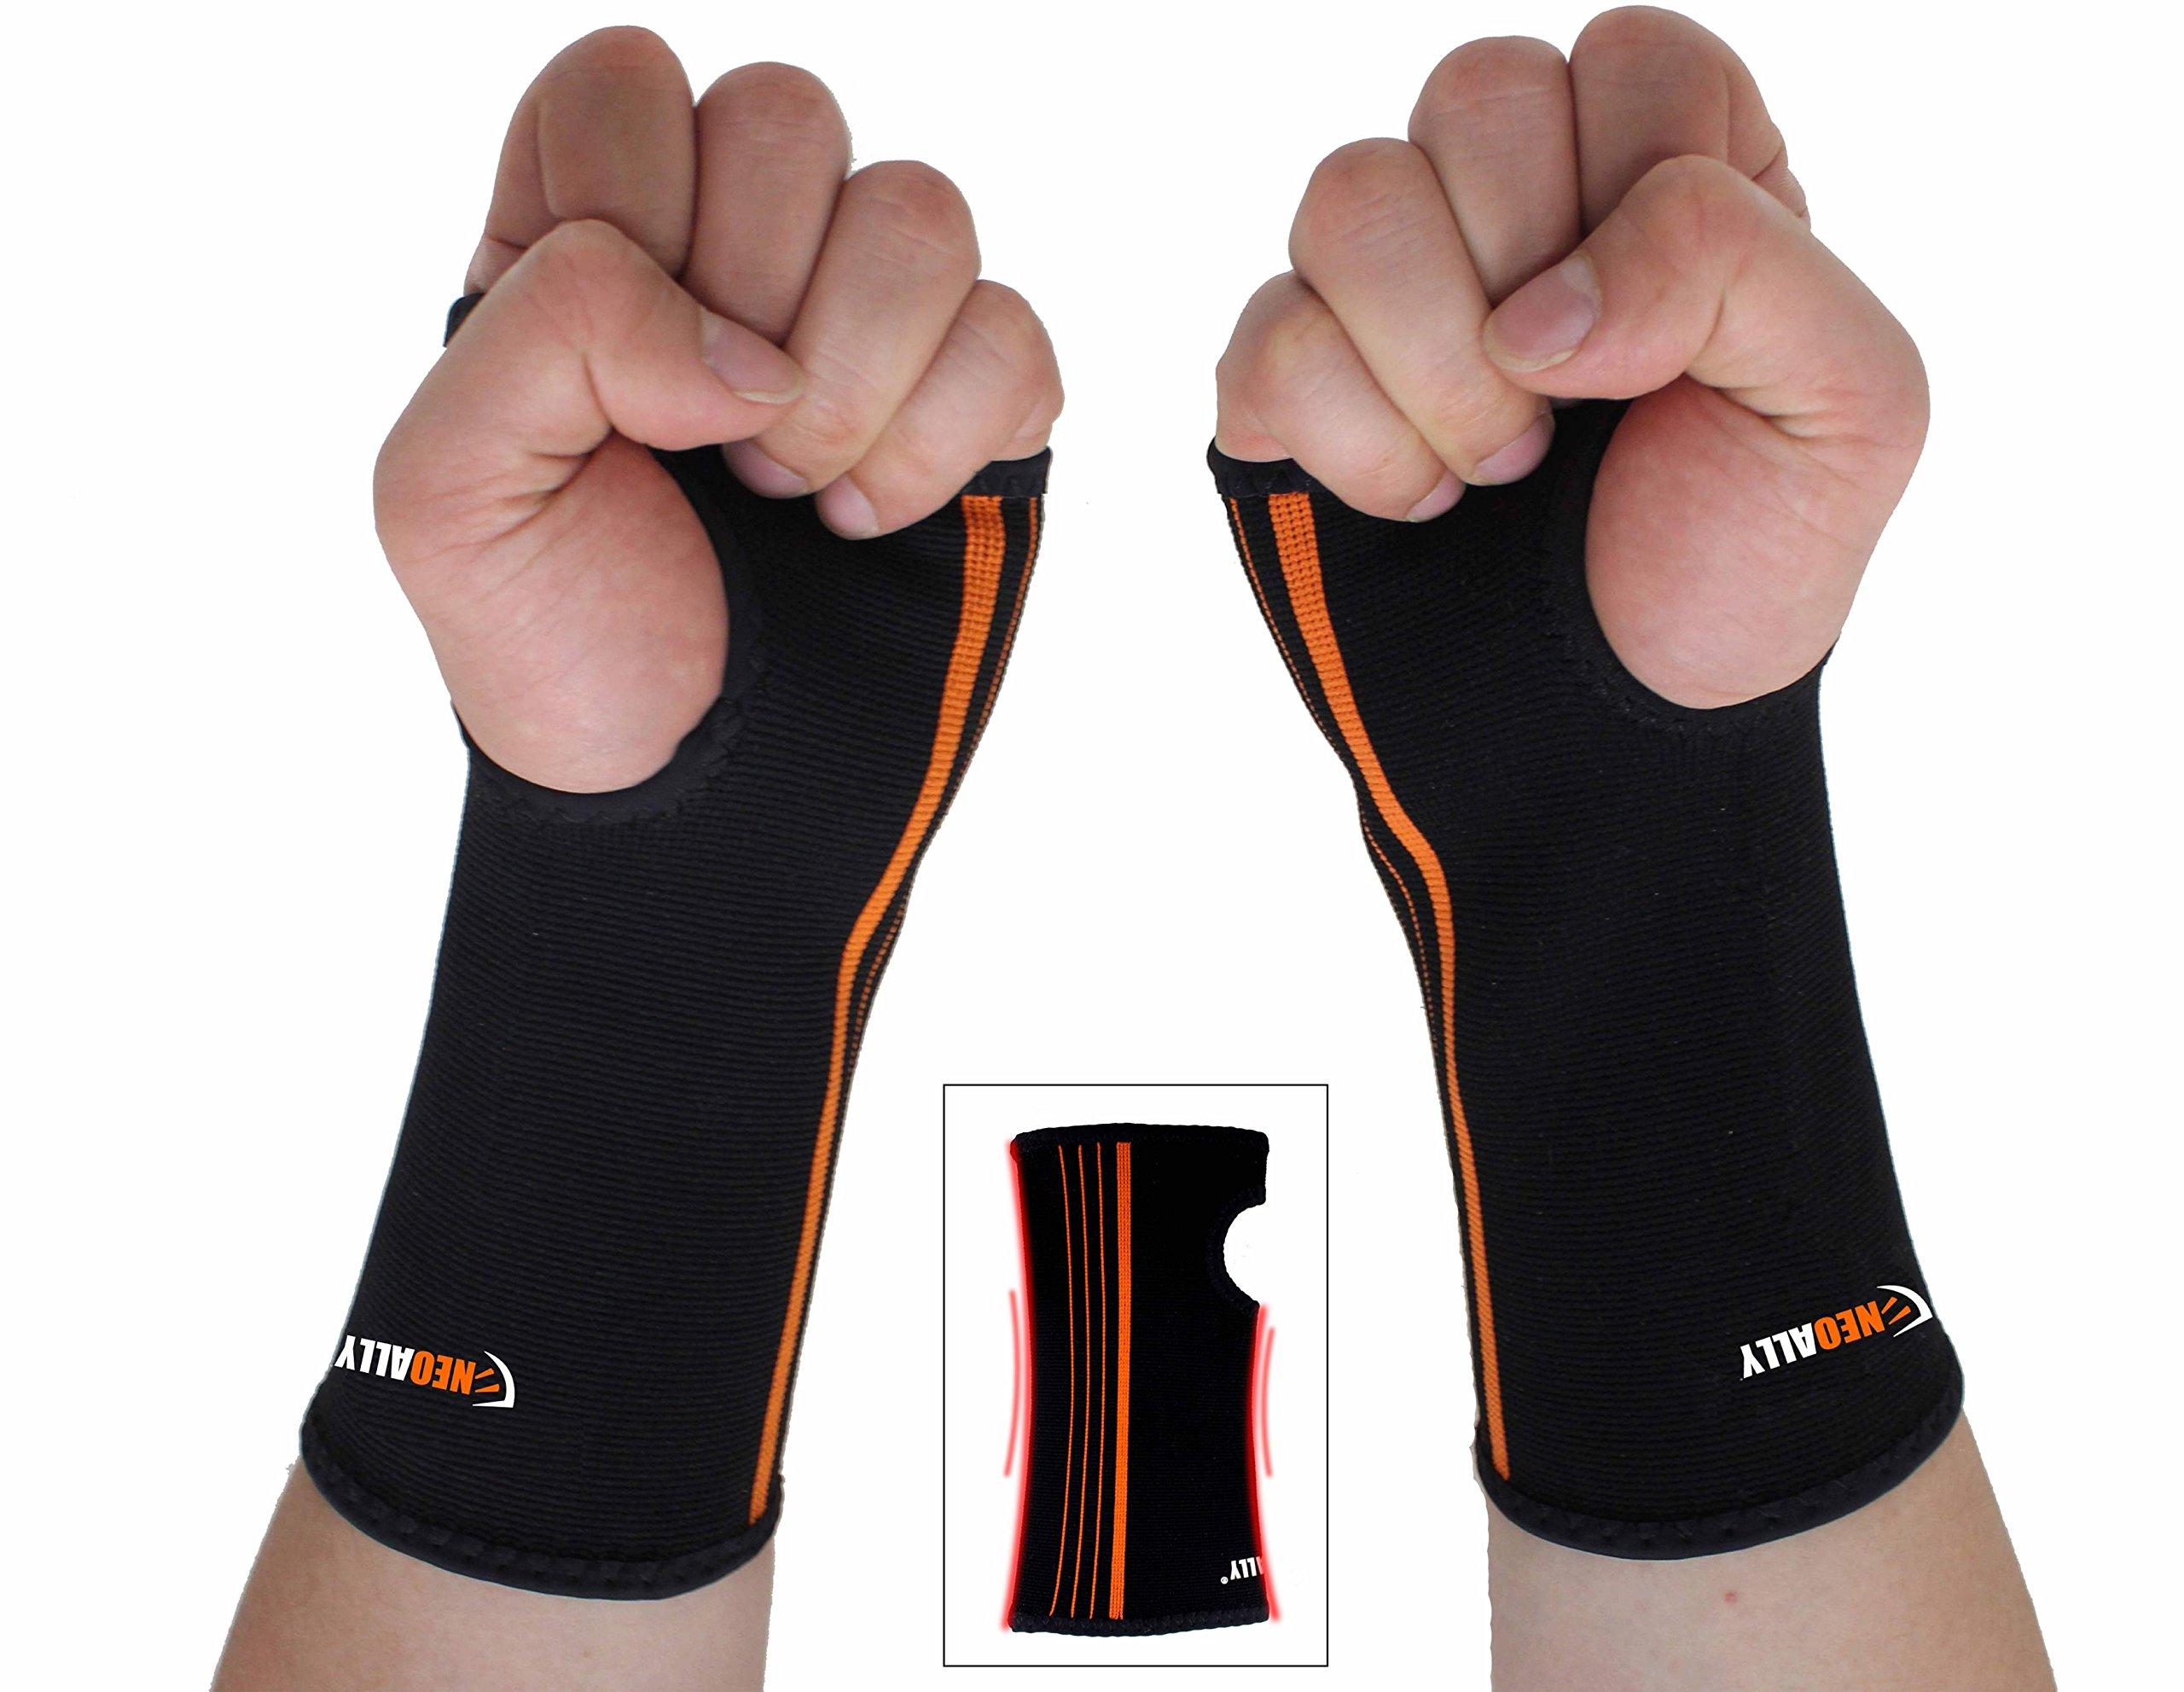 NEOALLY Wrist and Forearm Brace Compression Sleeve for Carpal Tunnel, Arthritis, Tendonitis, Bursitis and Wrist Sprain (Large 2-Pack)